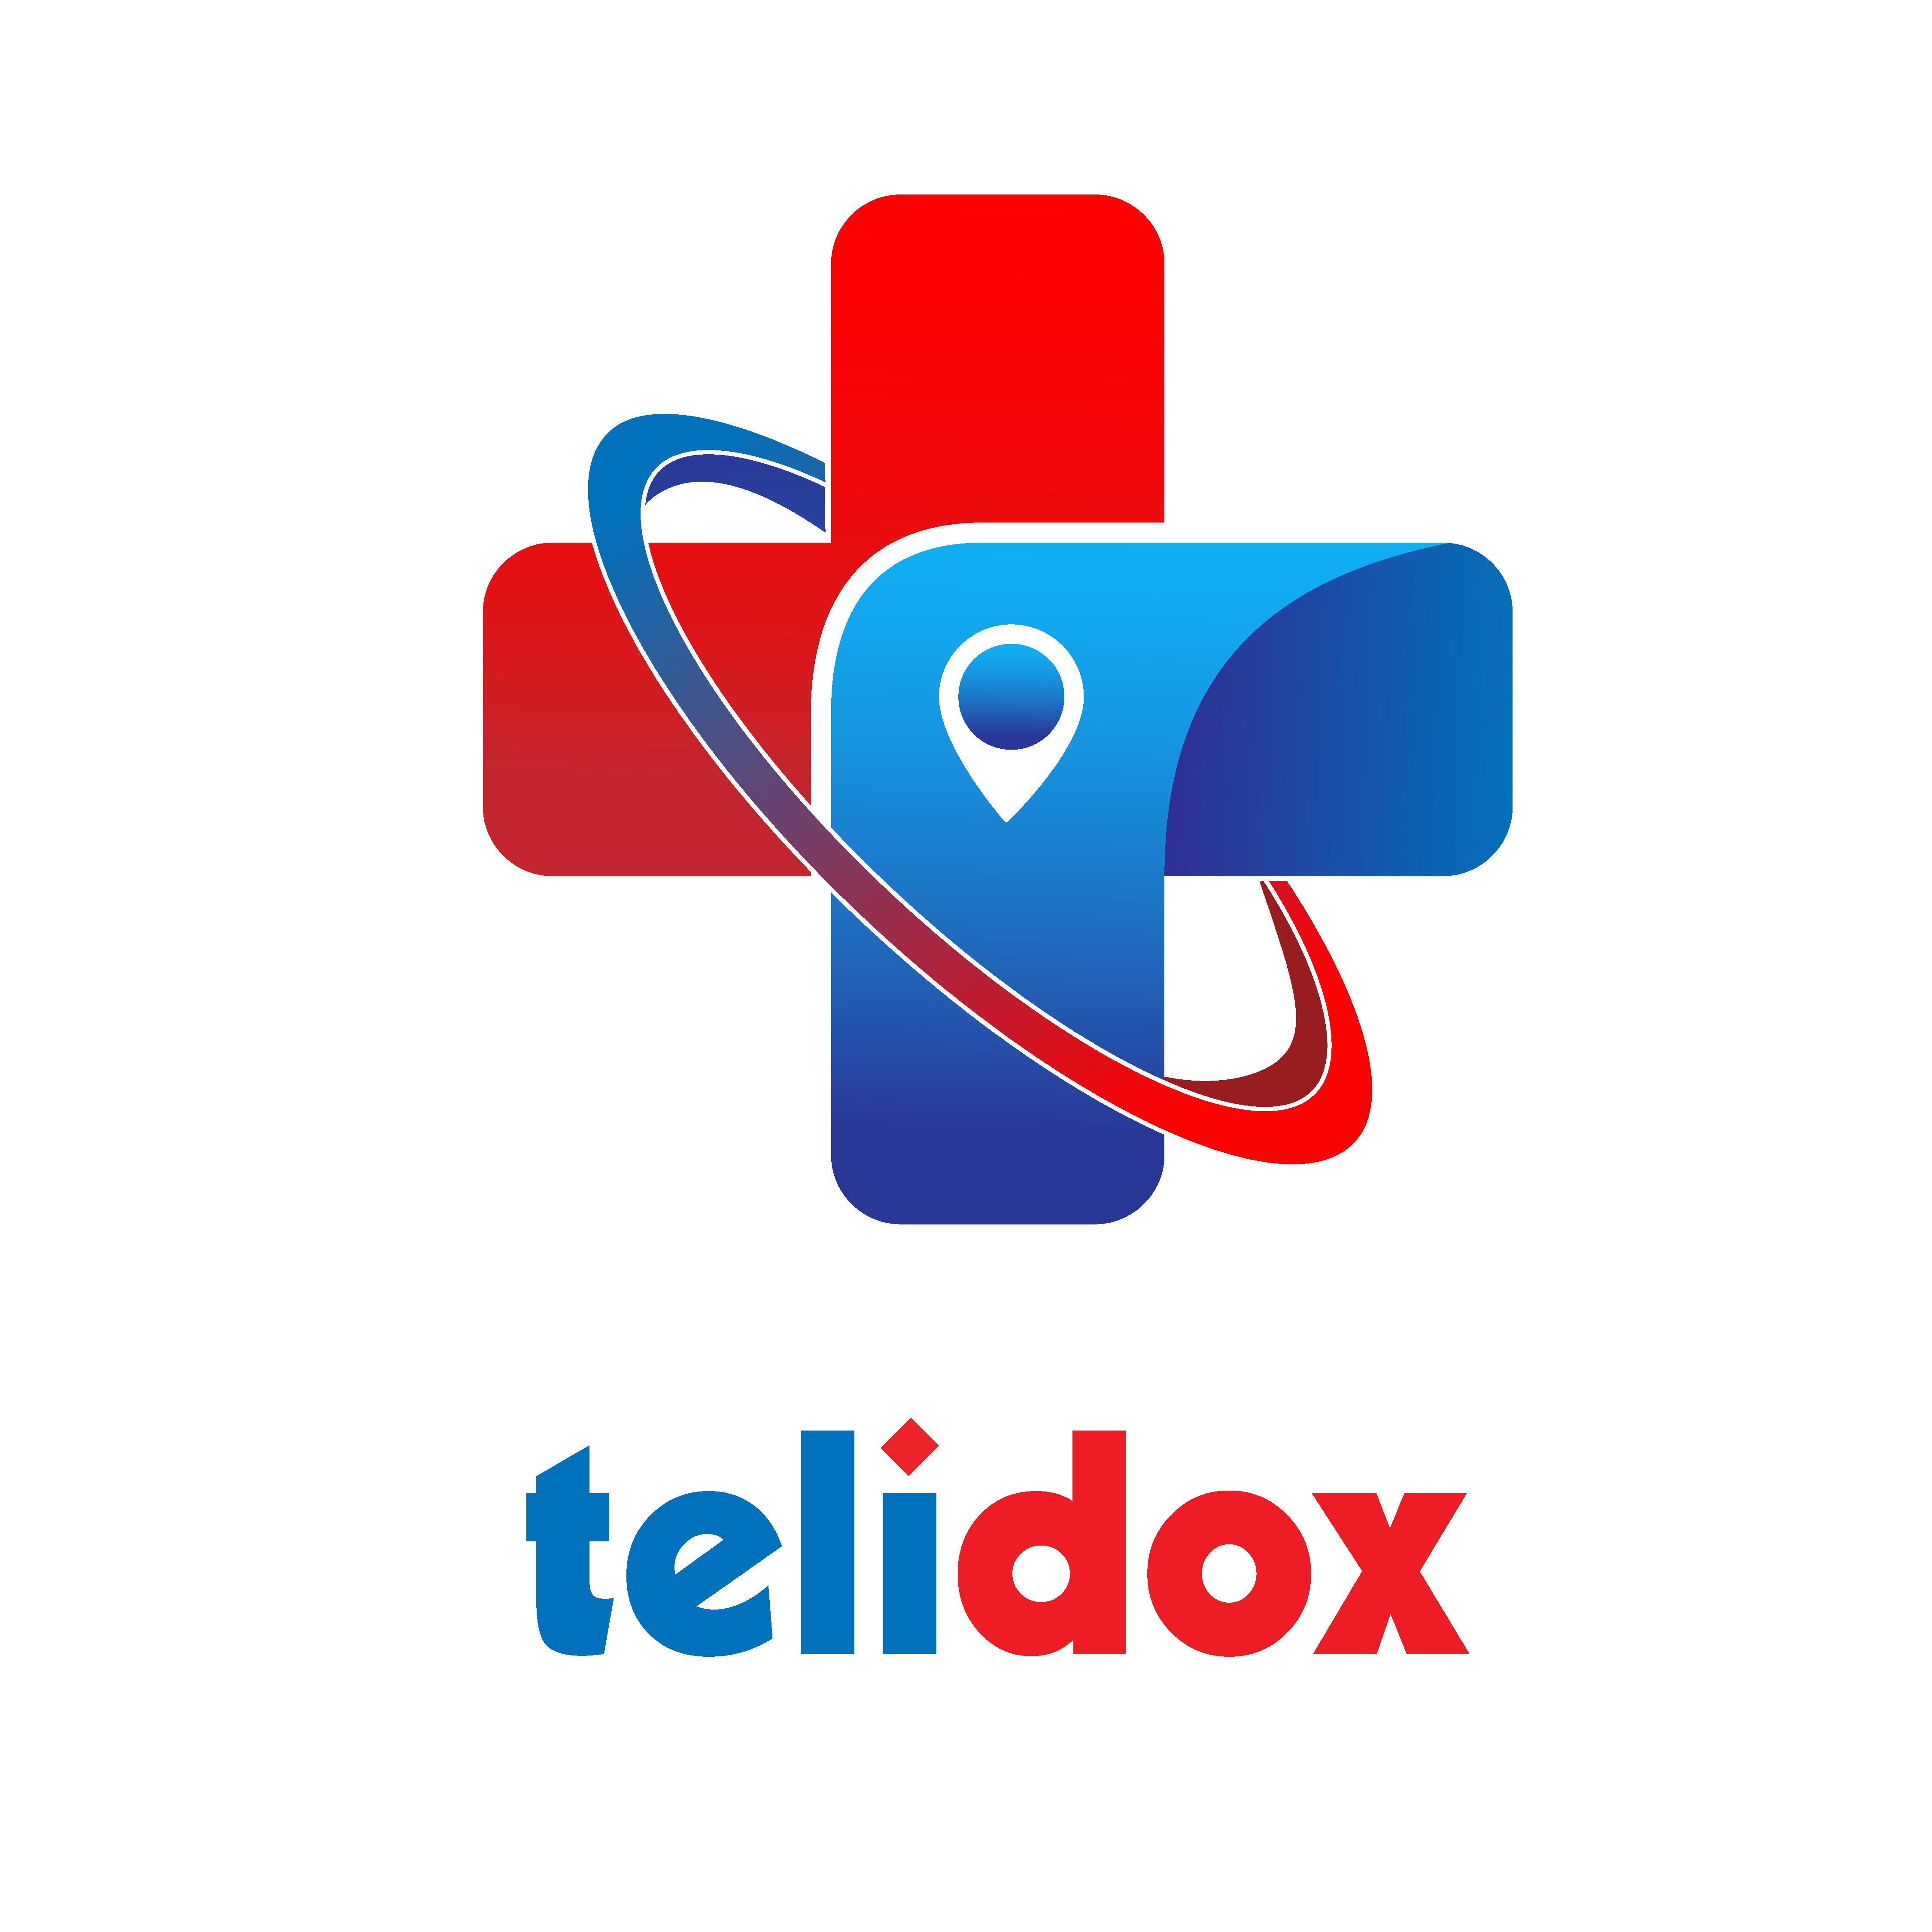 telidox logo-01